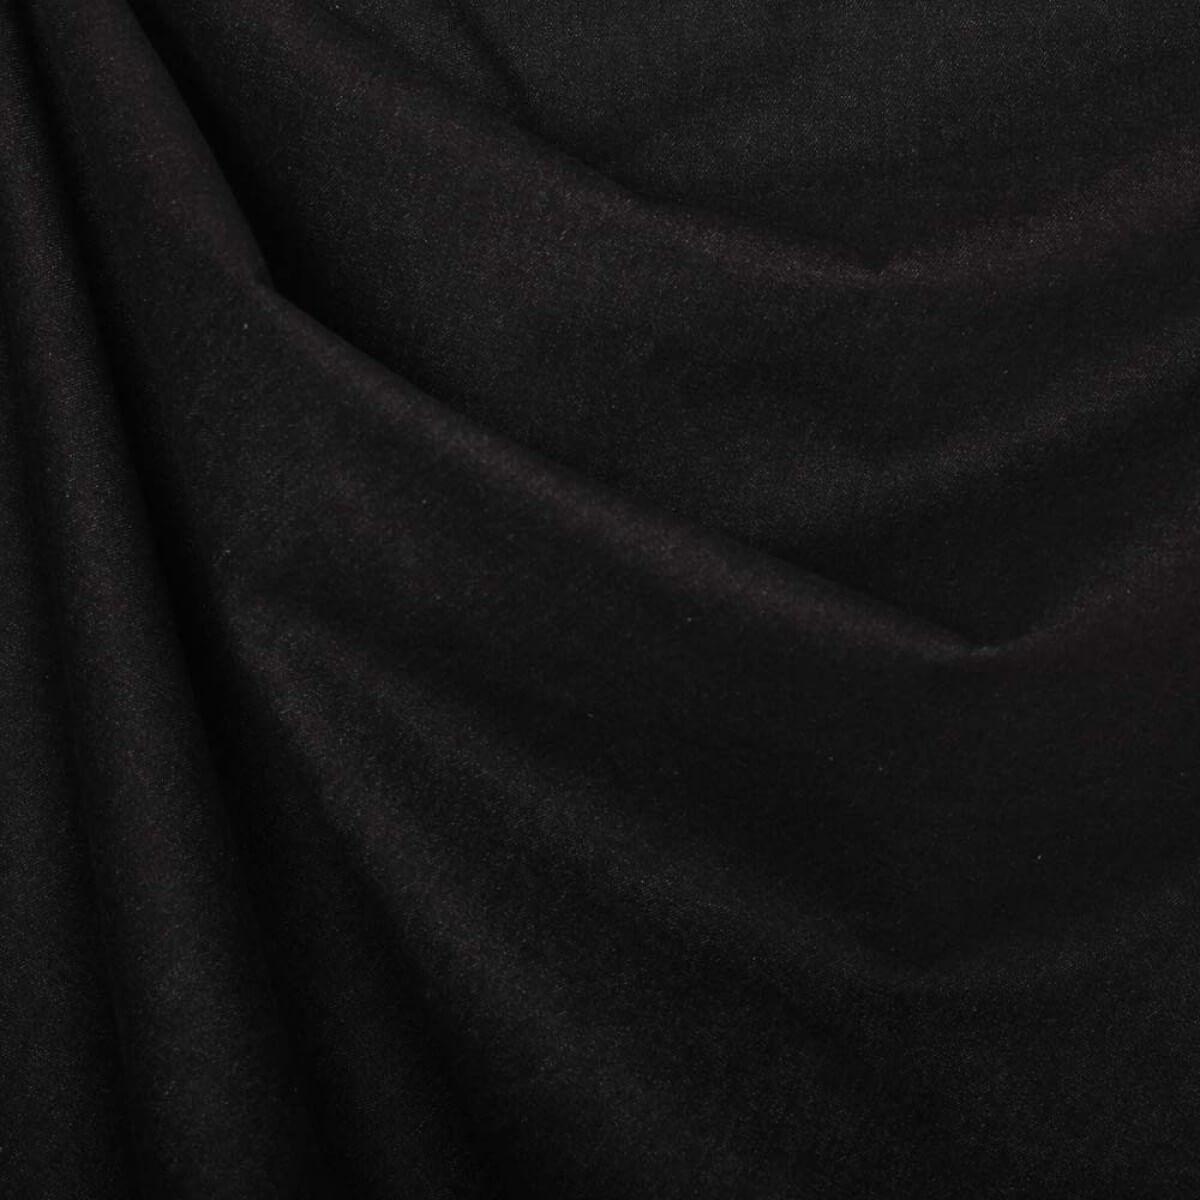 tissu jean uni 100 coton noir. Black Bedroom Furniture Sets. Home Design Ideas